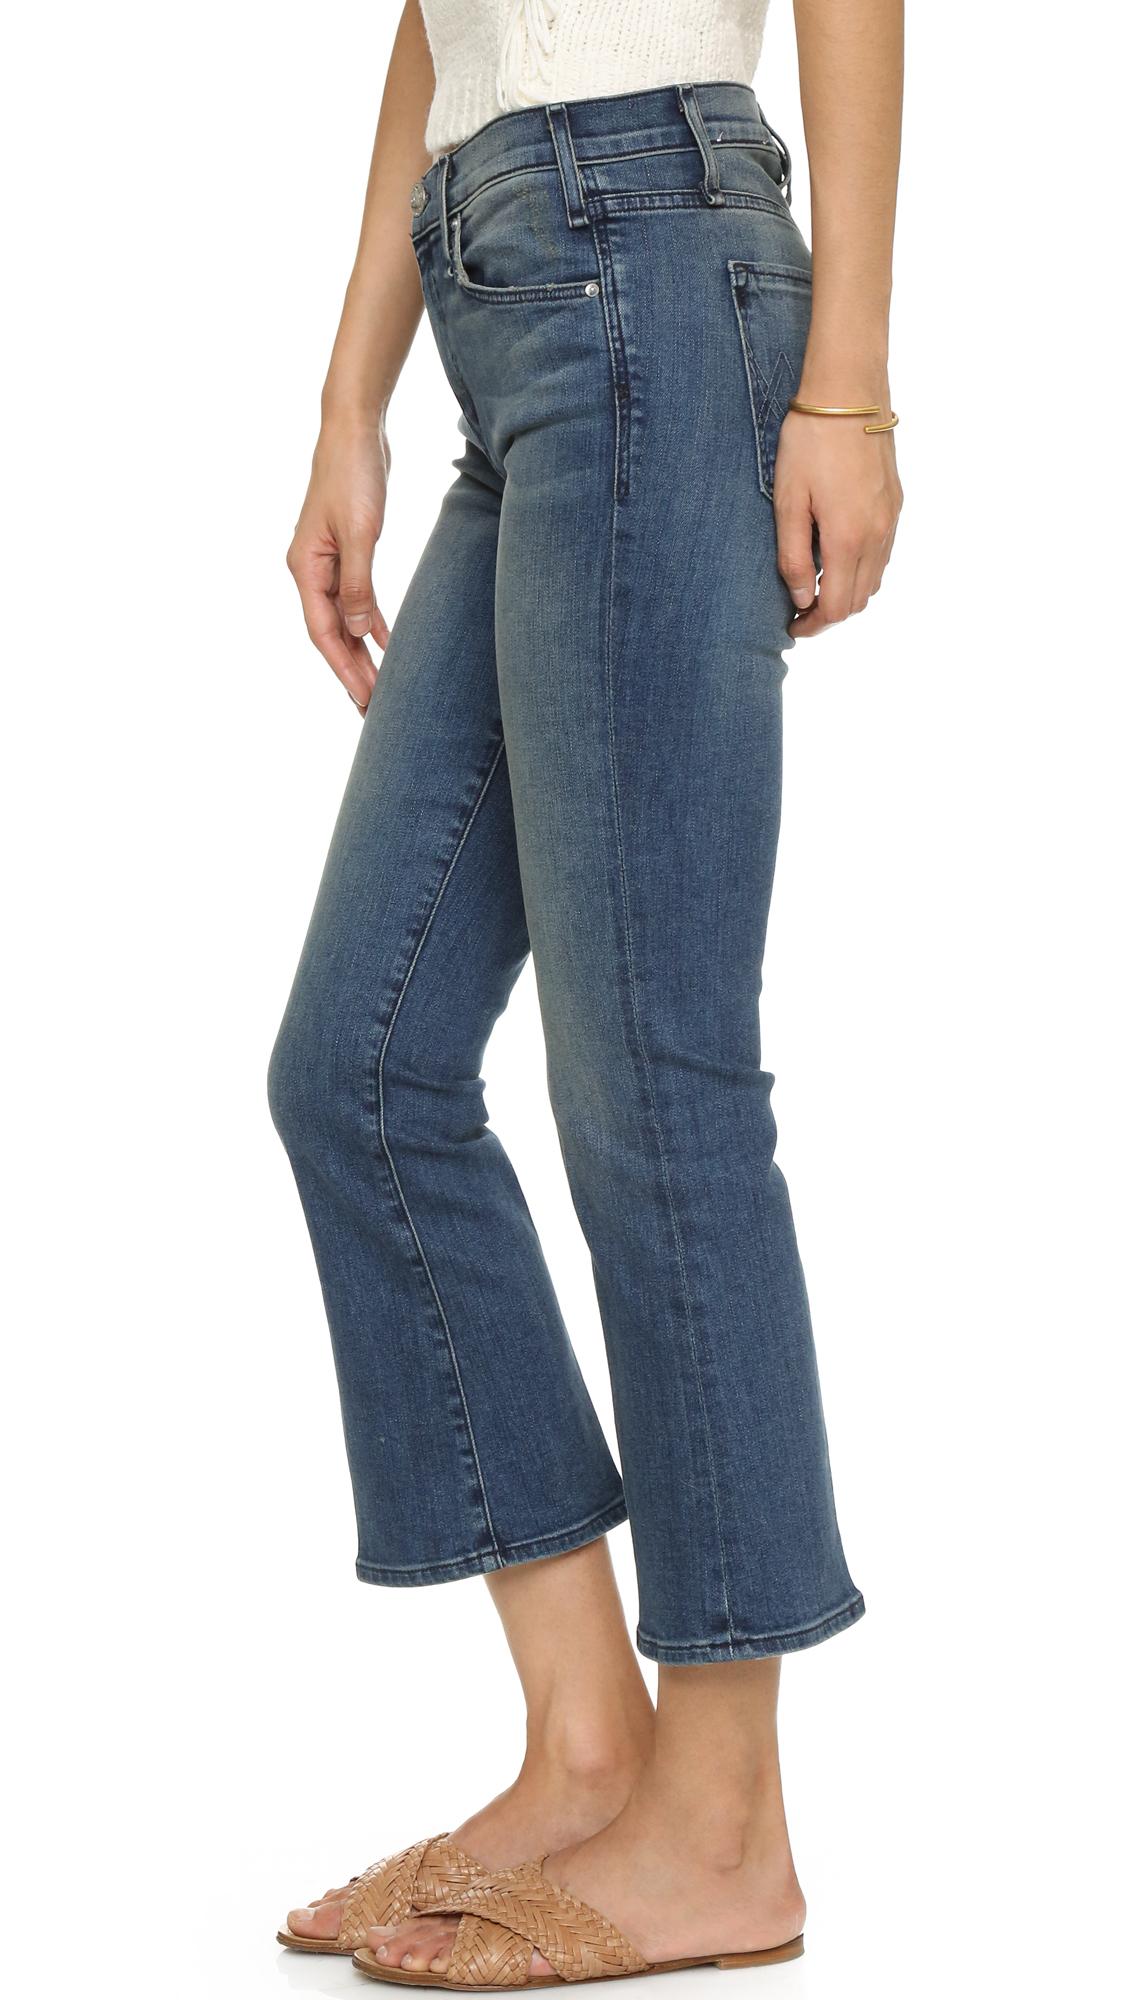 lyst mcguire denim cropped majorelle flare jeans in blue. Black Bedroom Furniture Sets. Home Design Ideas